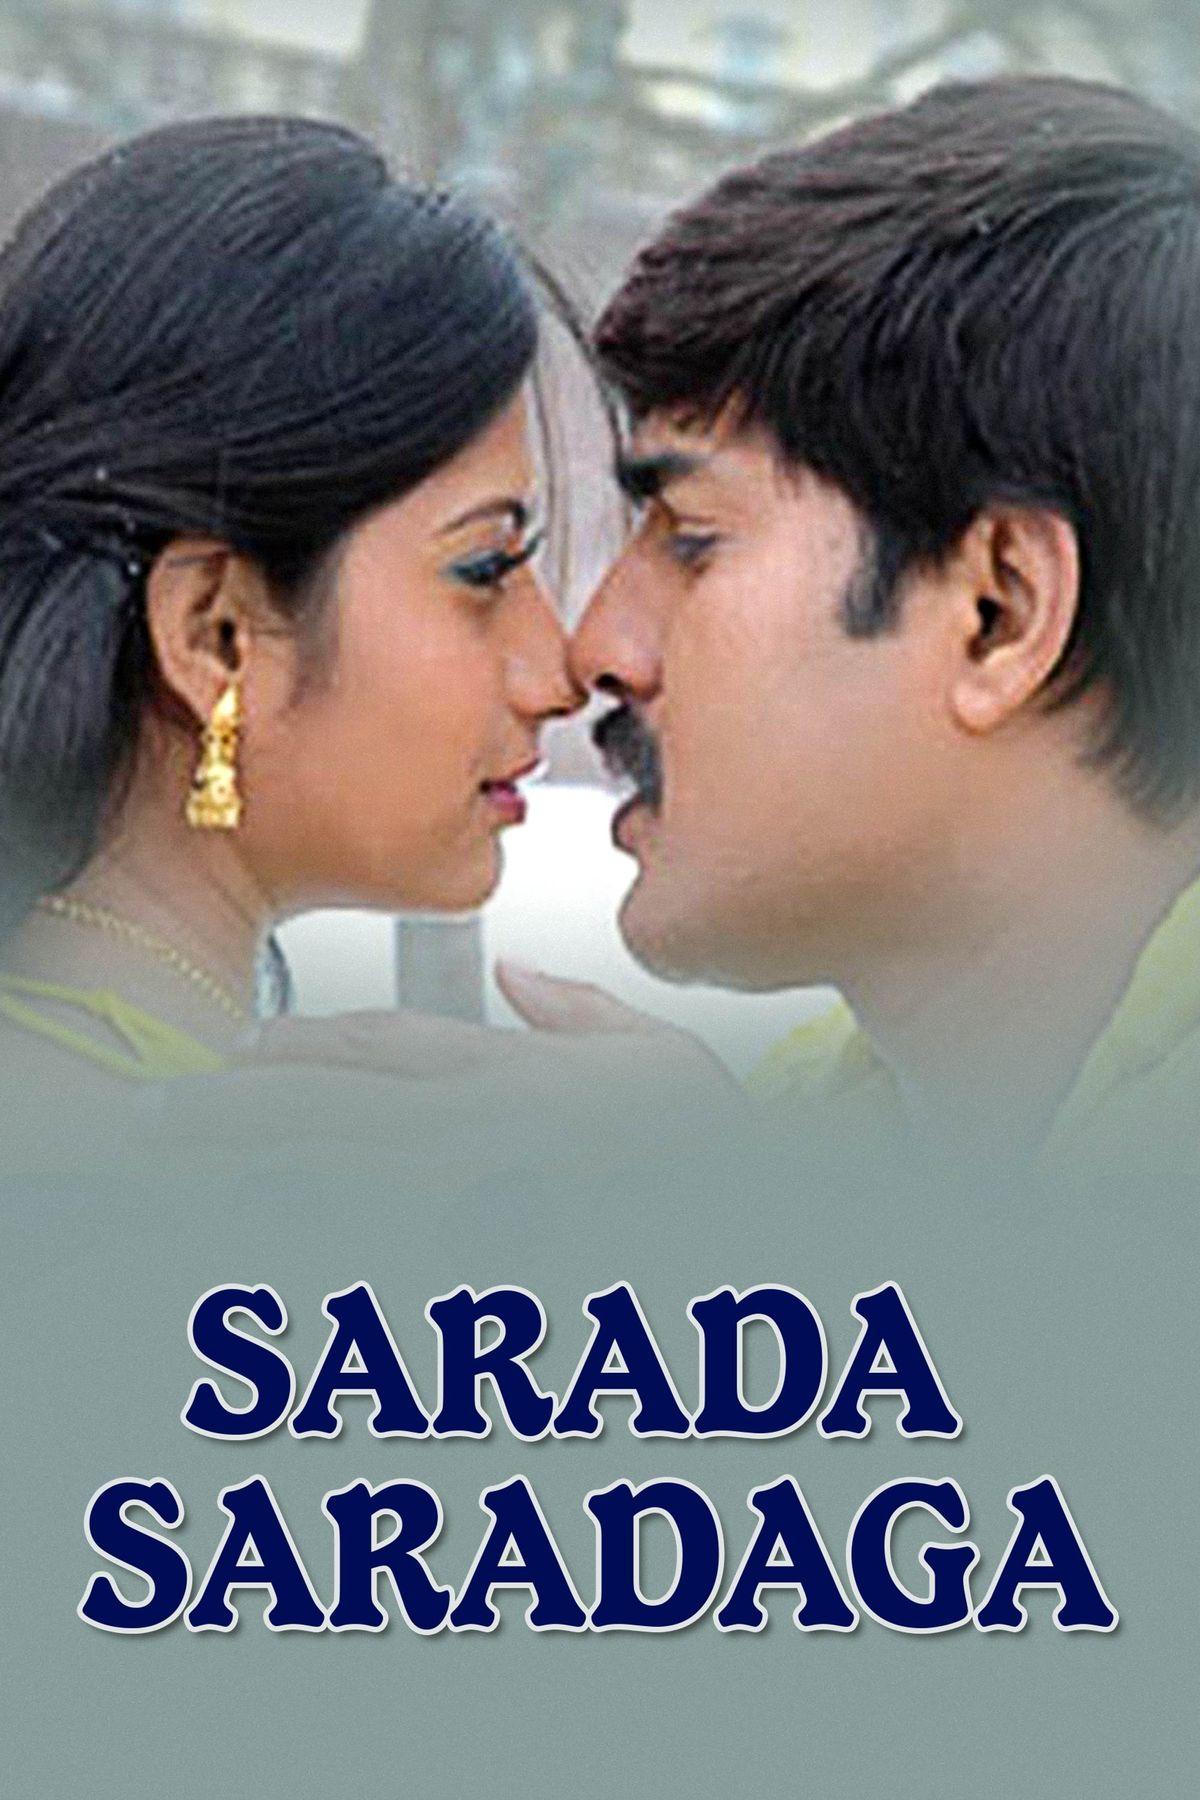 Sarada Saradaga